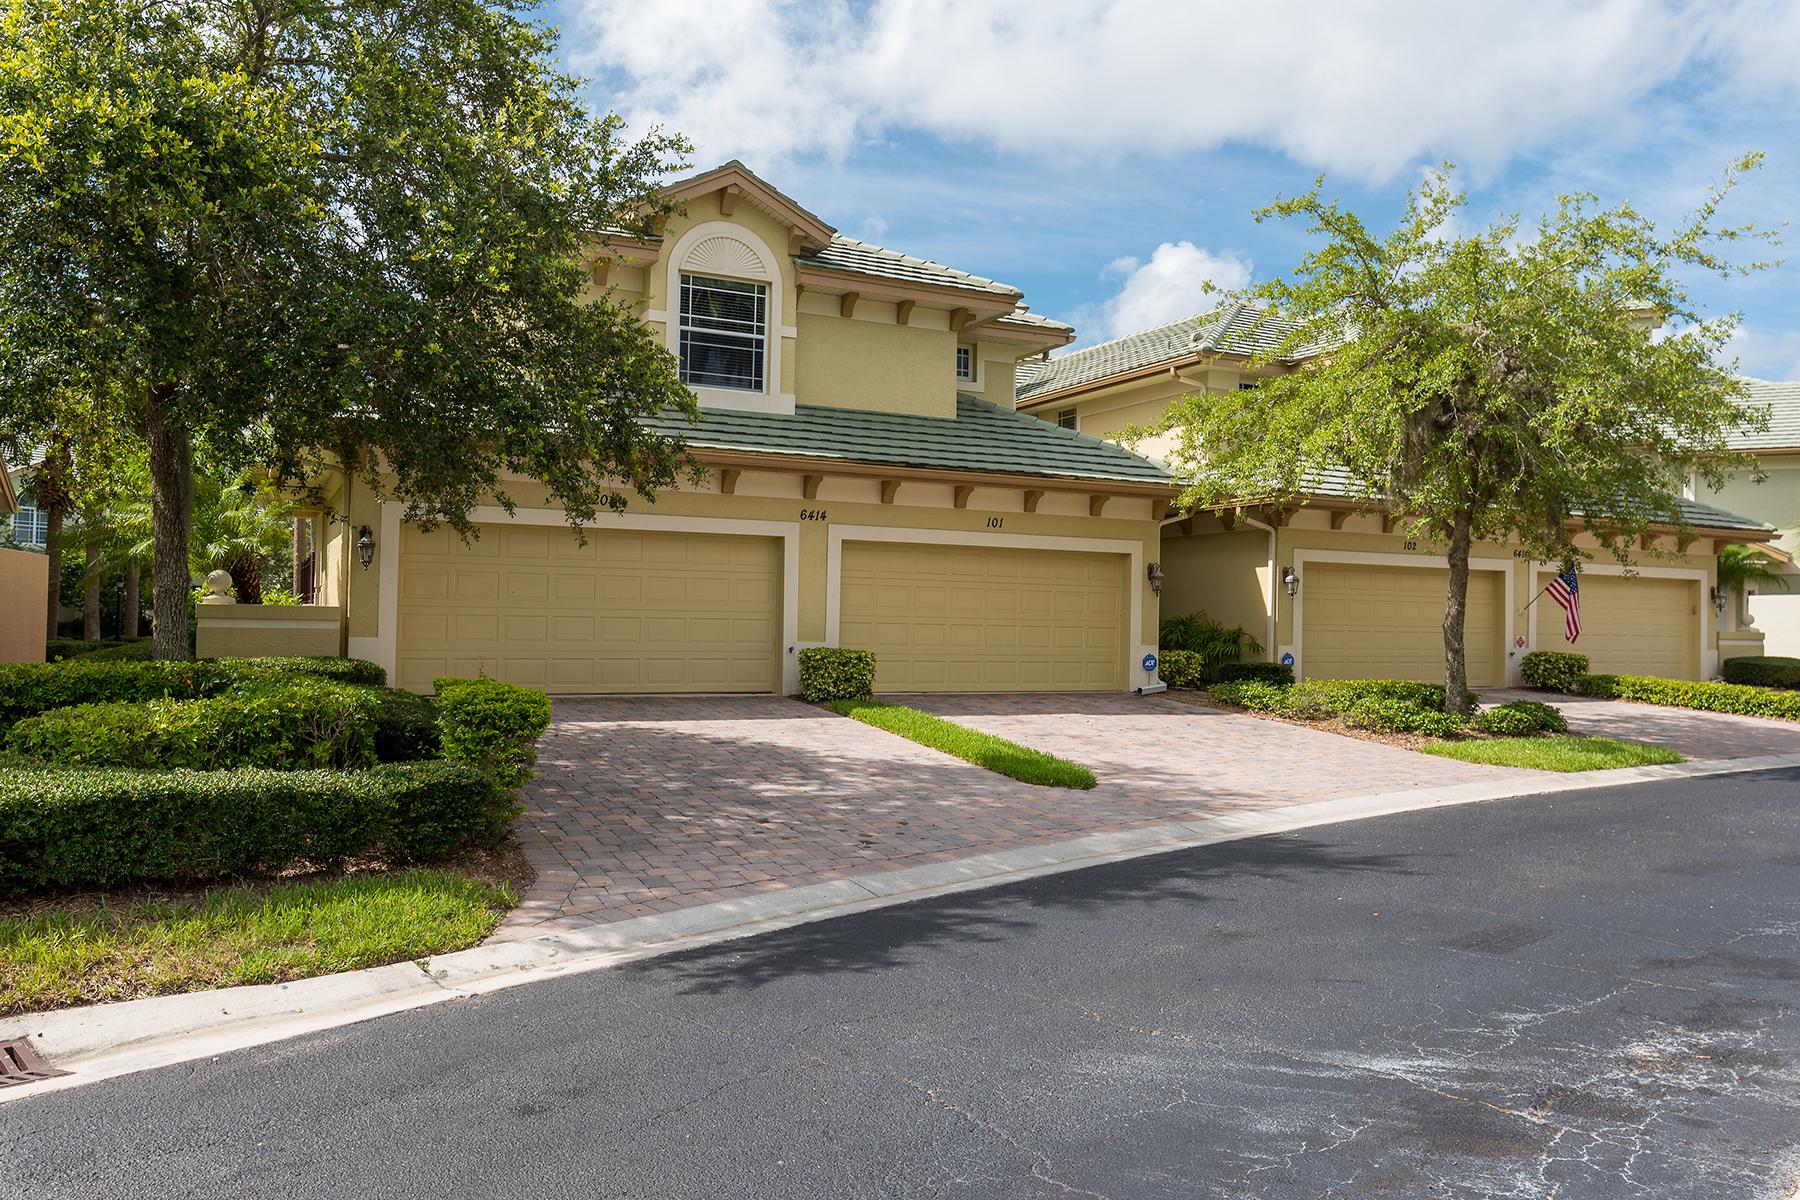 Condominium for Sale at MOORINGS AT EDGEWATER 6414 Moorings Point Cir 201 Lakewood Ranch, Florida, 34202 United States